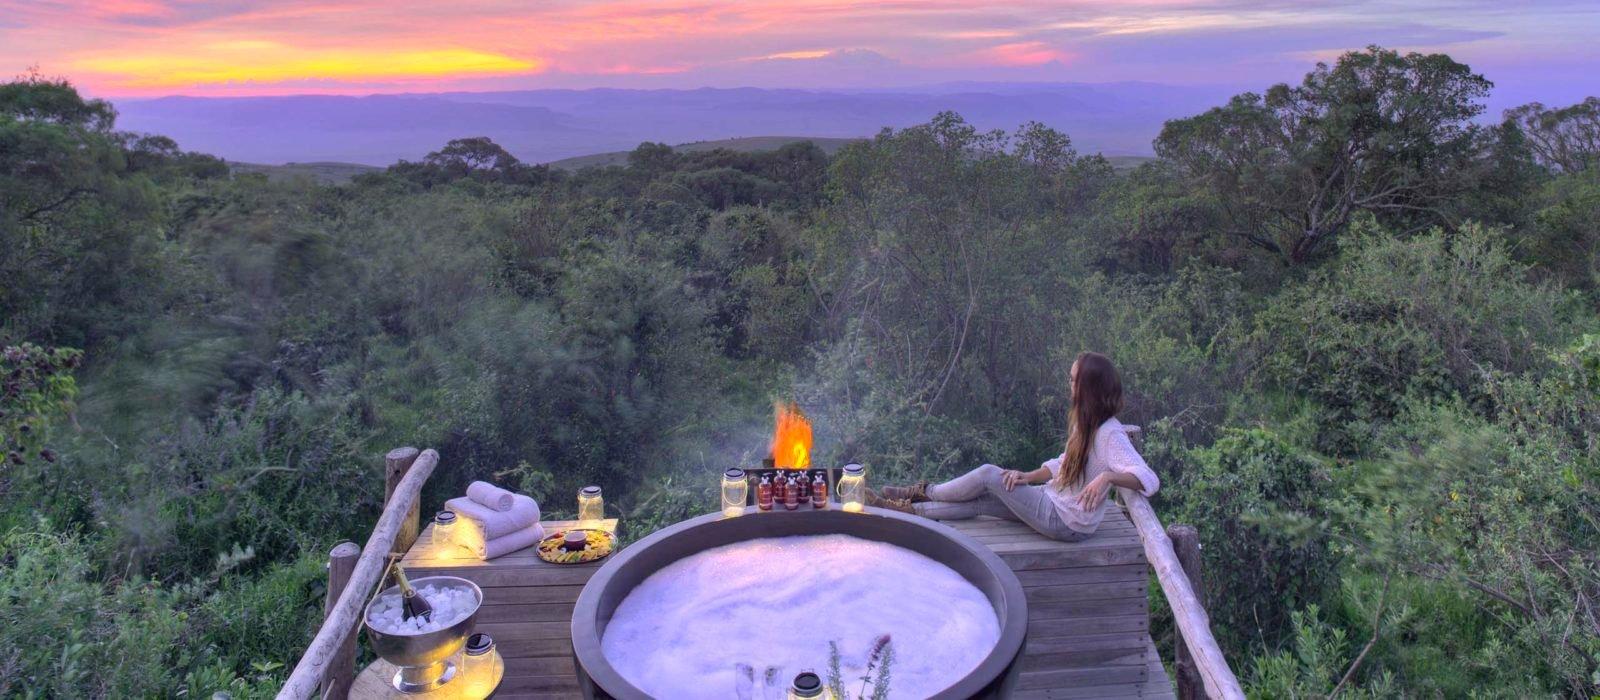 Honeymoon hot tub, The Highlands Ngorongoro, Tanzania